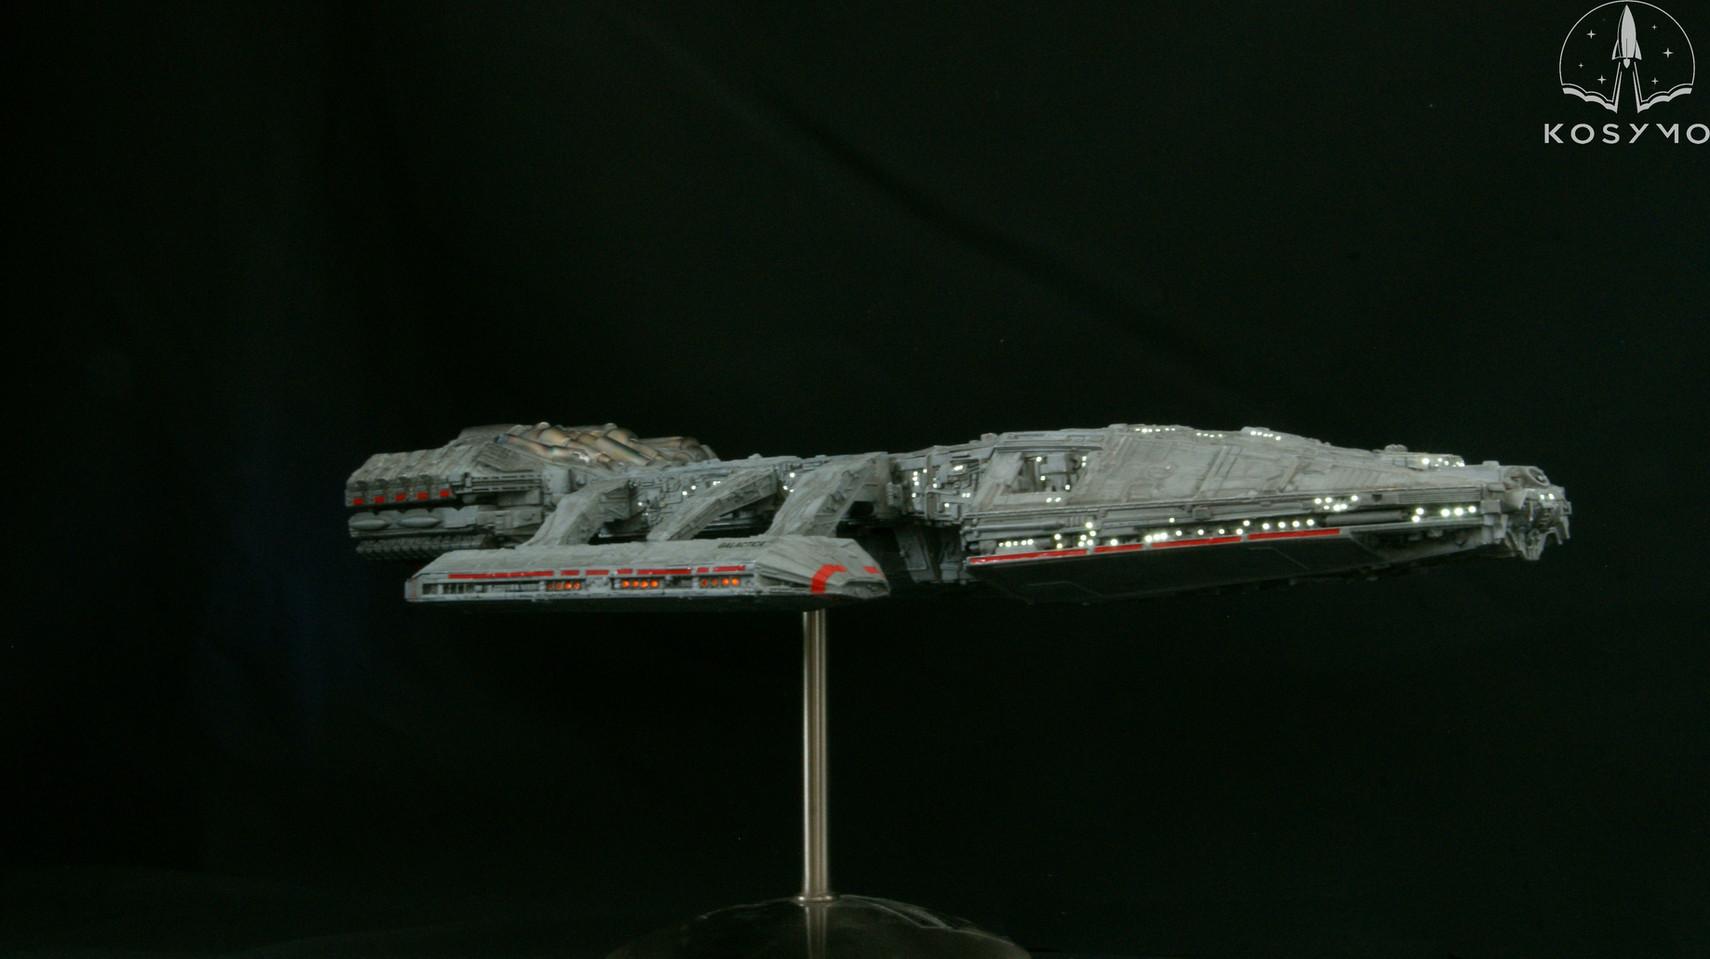 Galactica_031.JPG